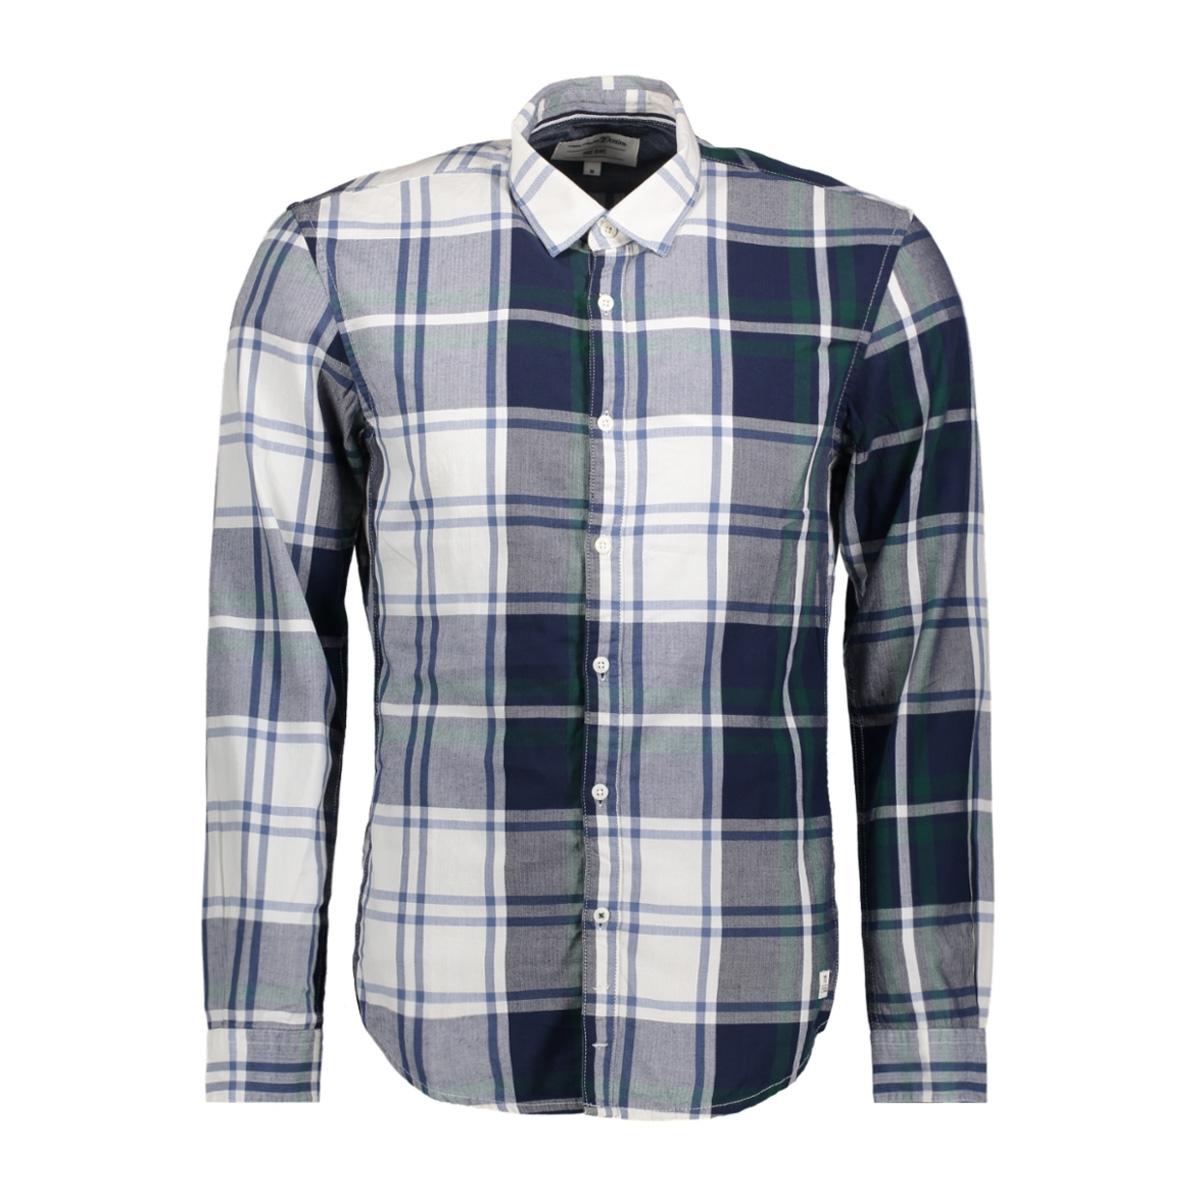 2055066.00.12 tom tailor overhemd 2132